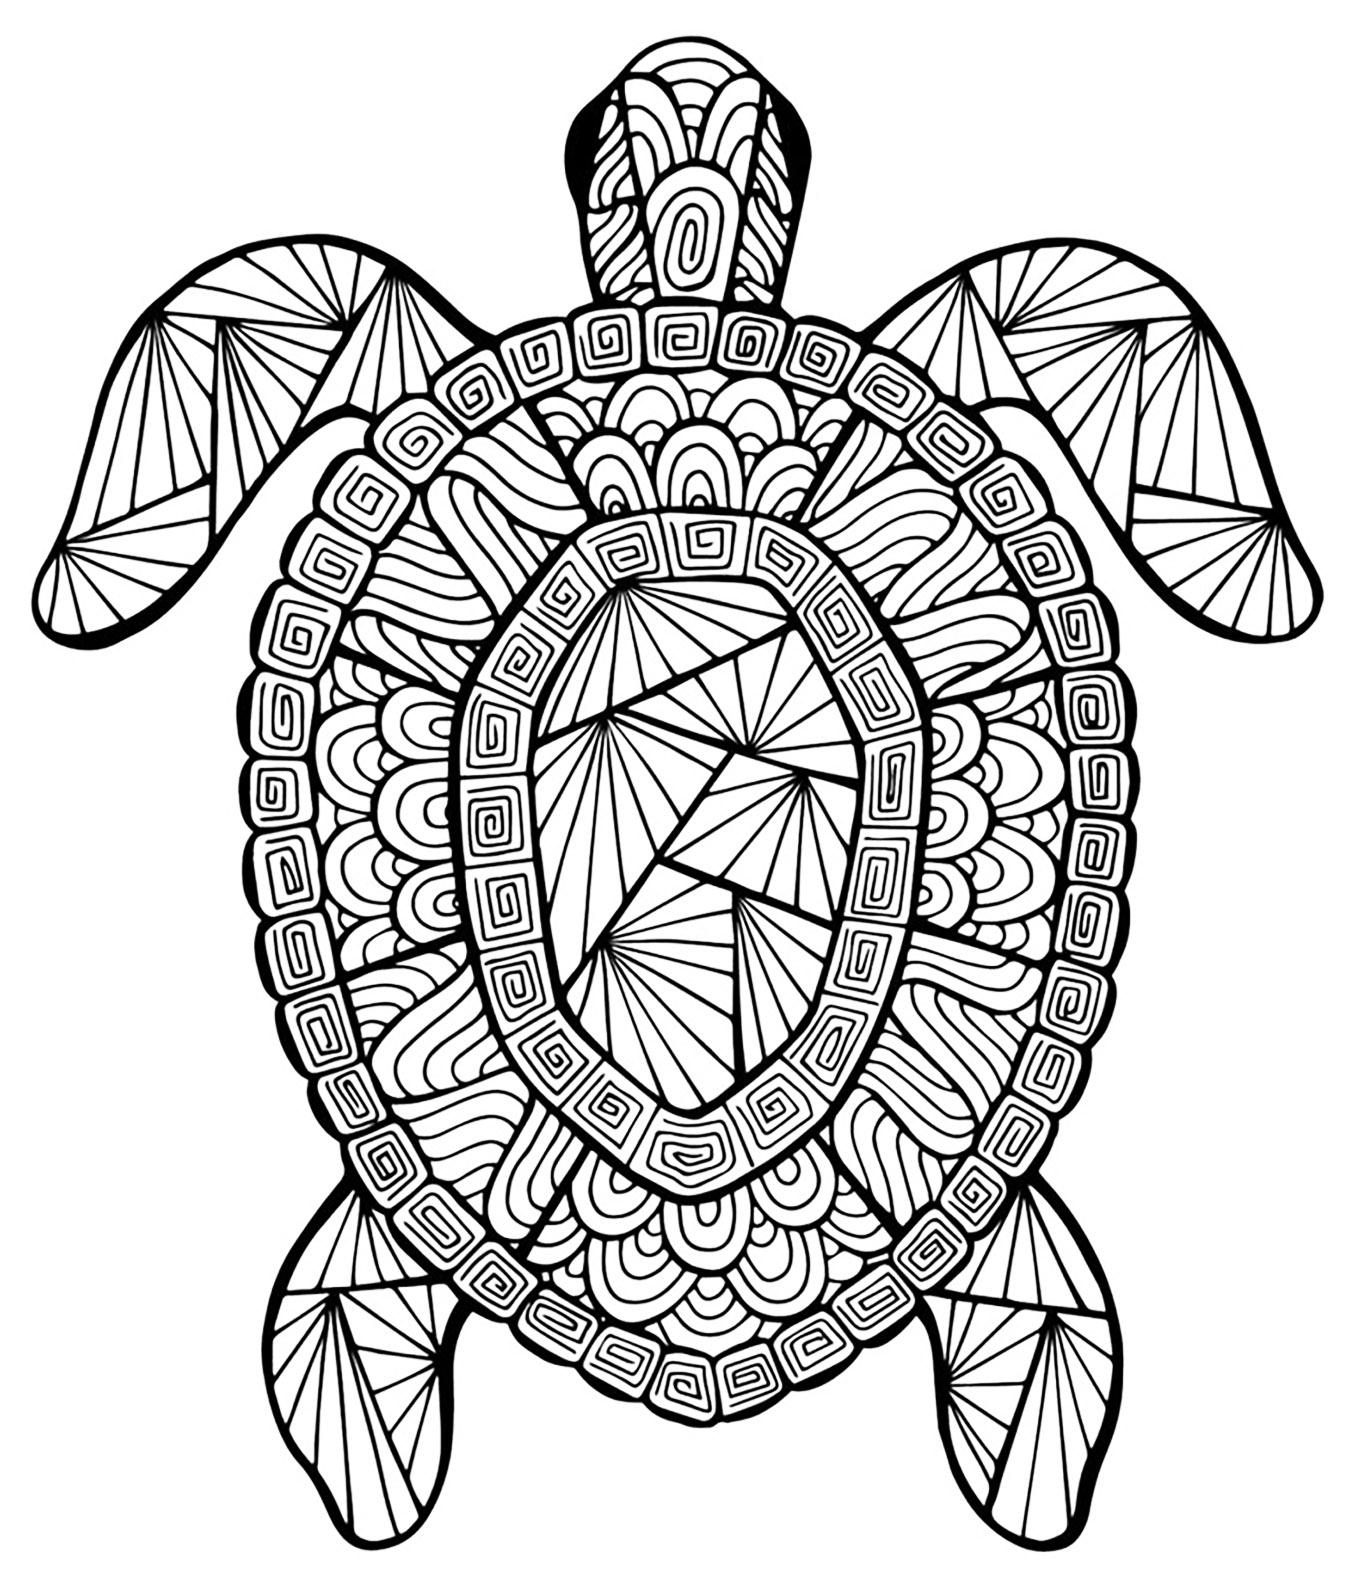 Tortugas 12830 Tortugas Colorear Para Adultos